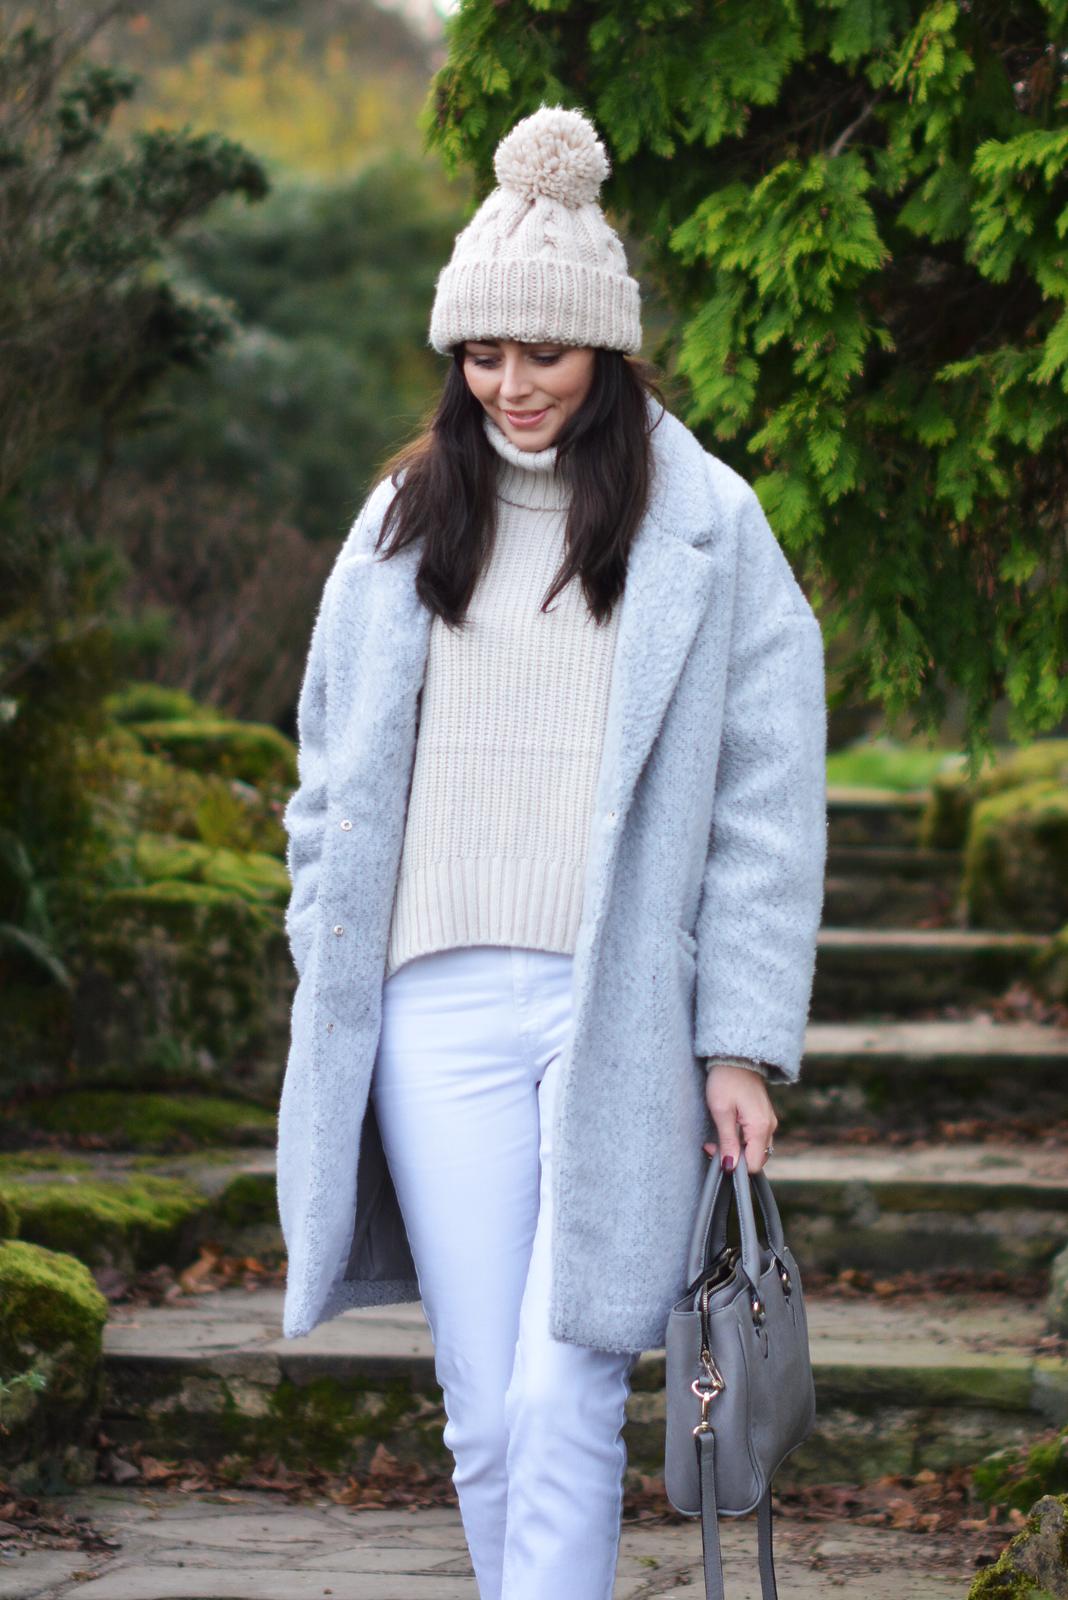 EJSTYLE - winter whites OOTD, grey primark coat, Cream topshop roll neck sweater jumper, grey zara city bag mini, cream bobble hat knitted